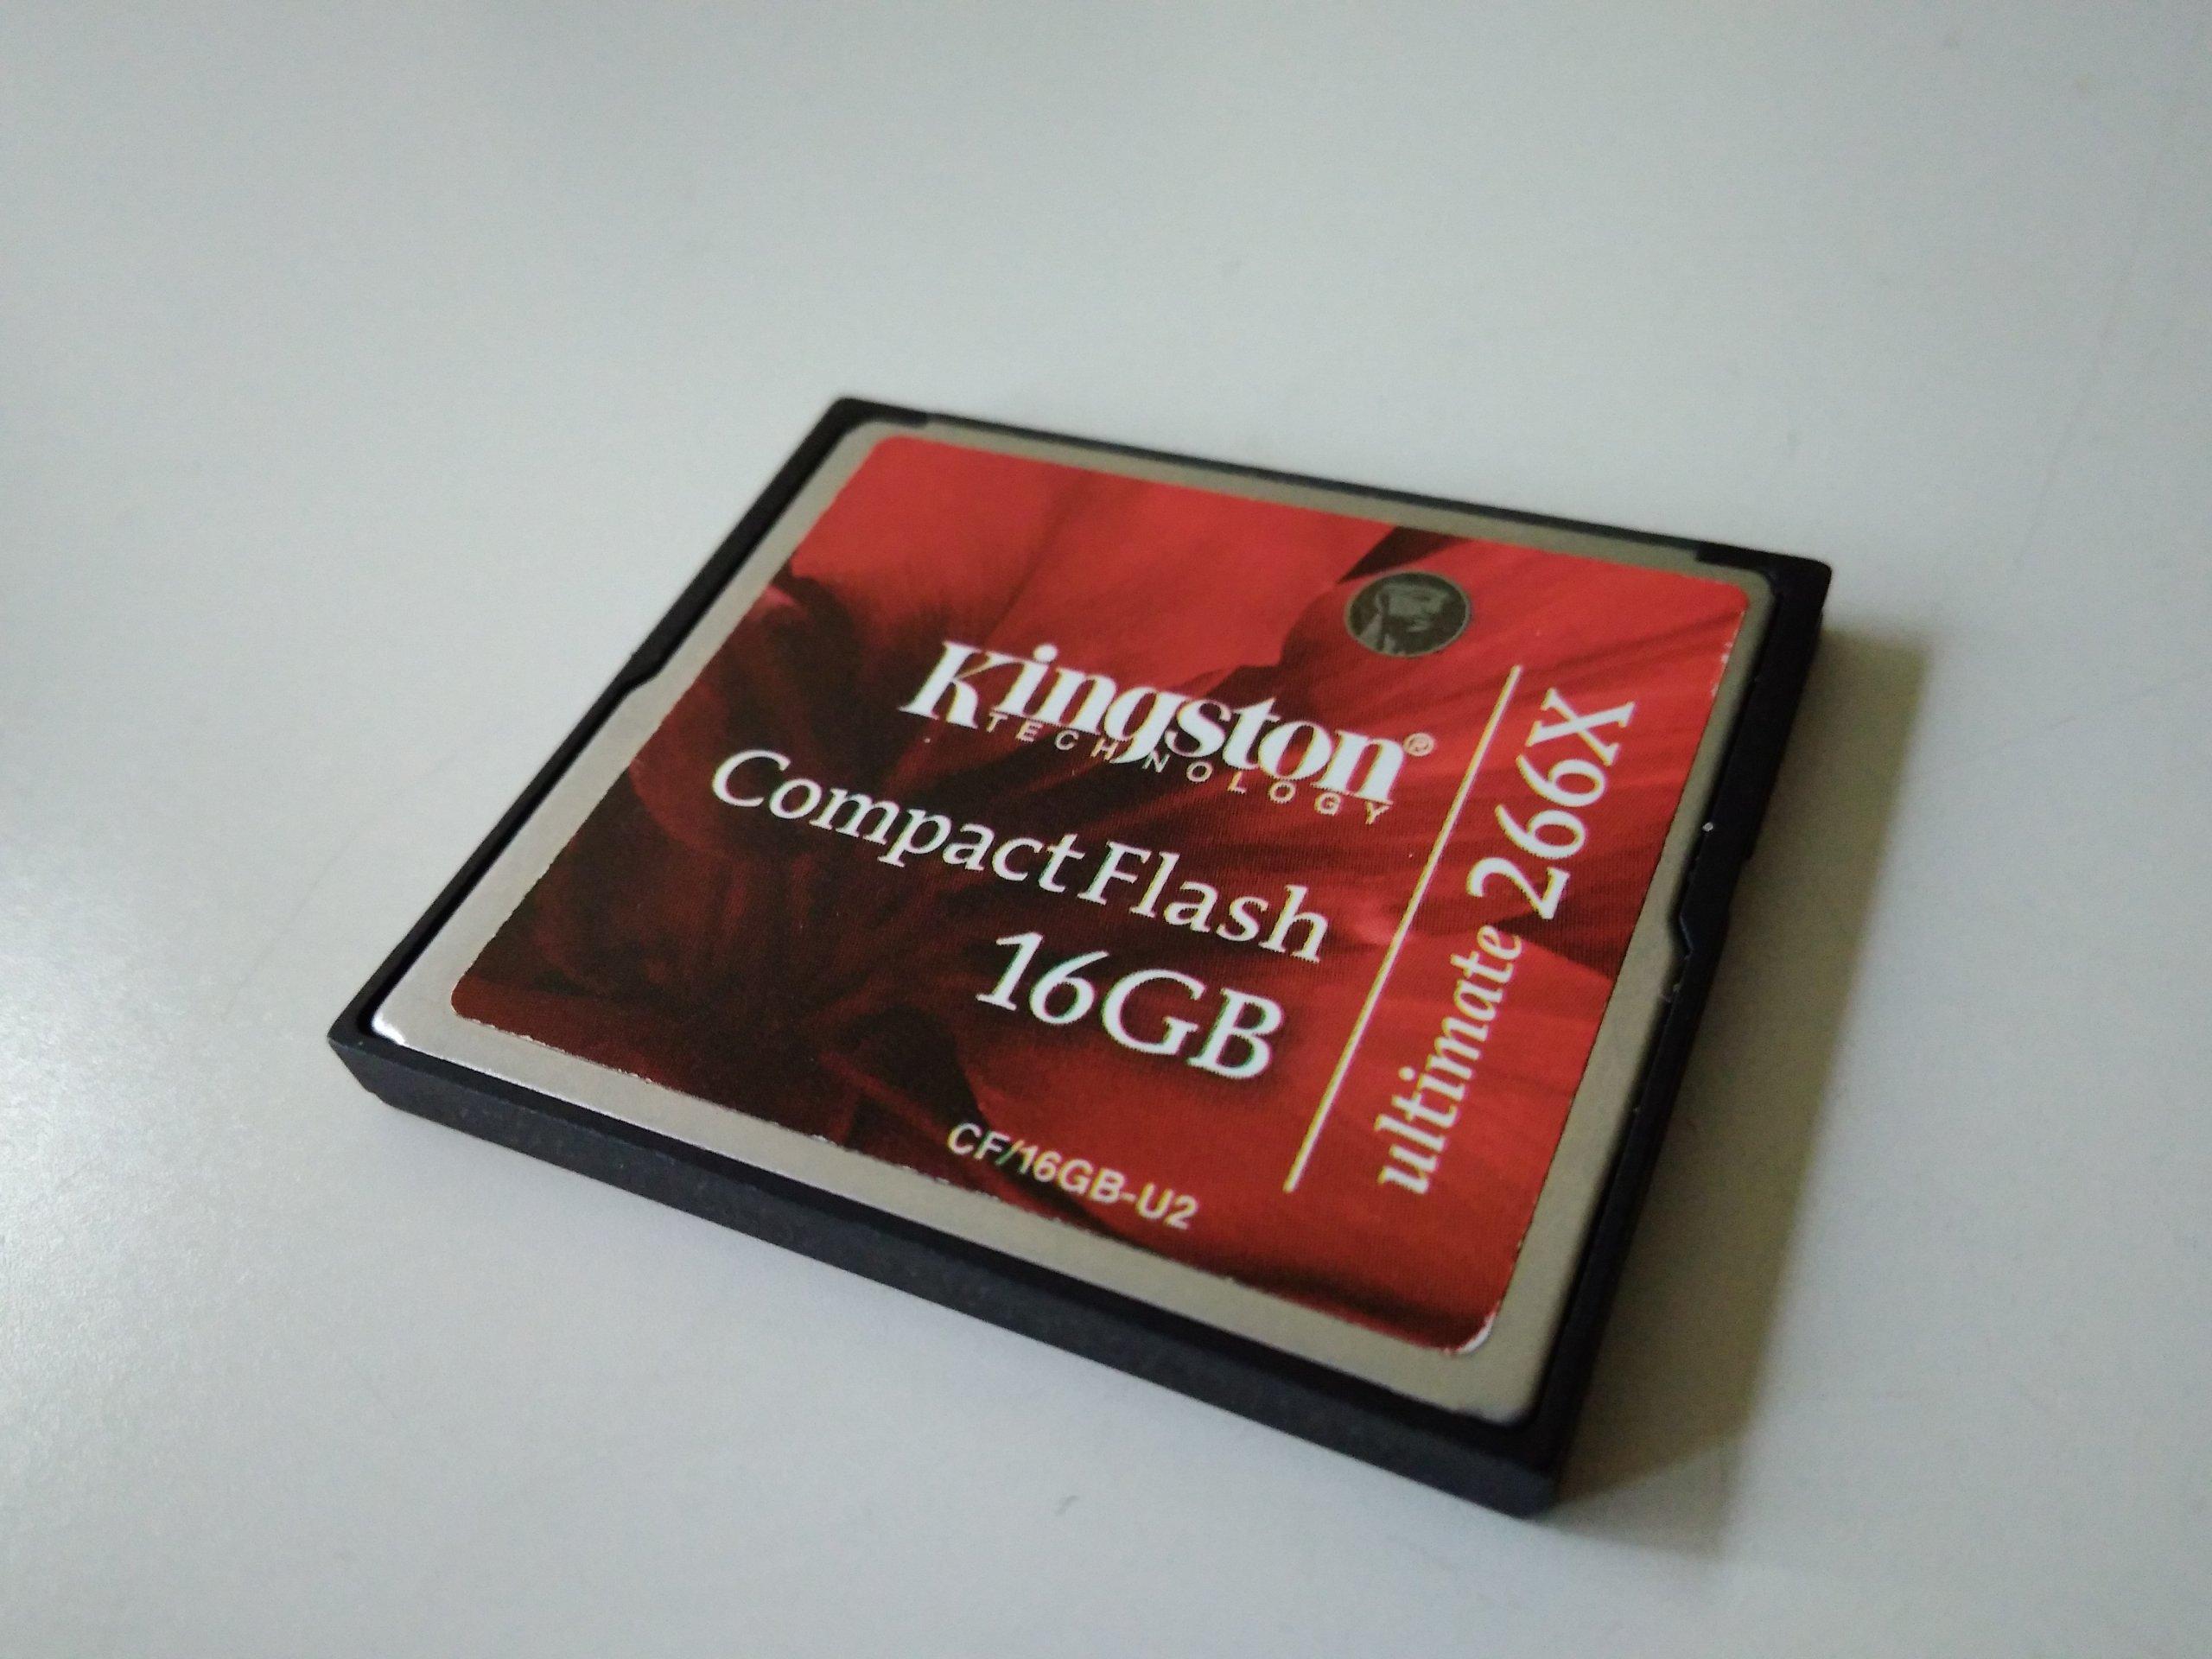 Karta Cf 16 Gb Kingston 7050282918 Oficjalne Archiwum Allegro